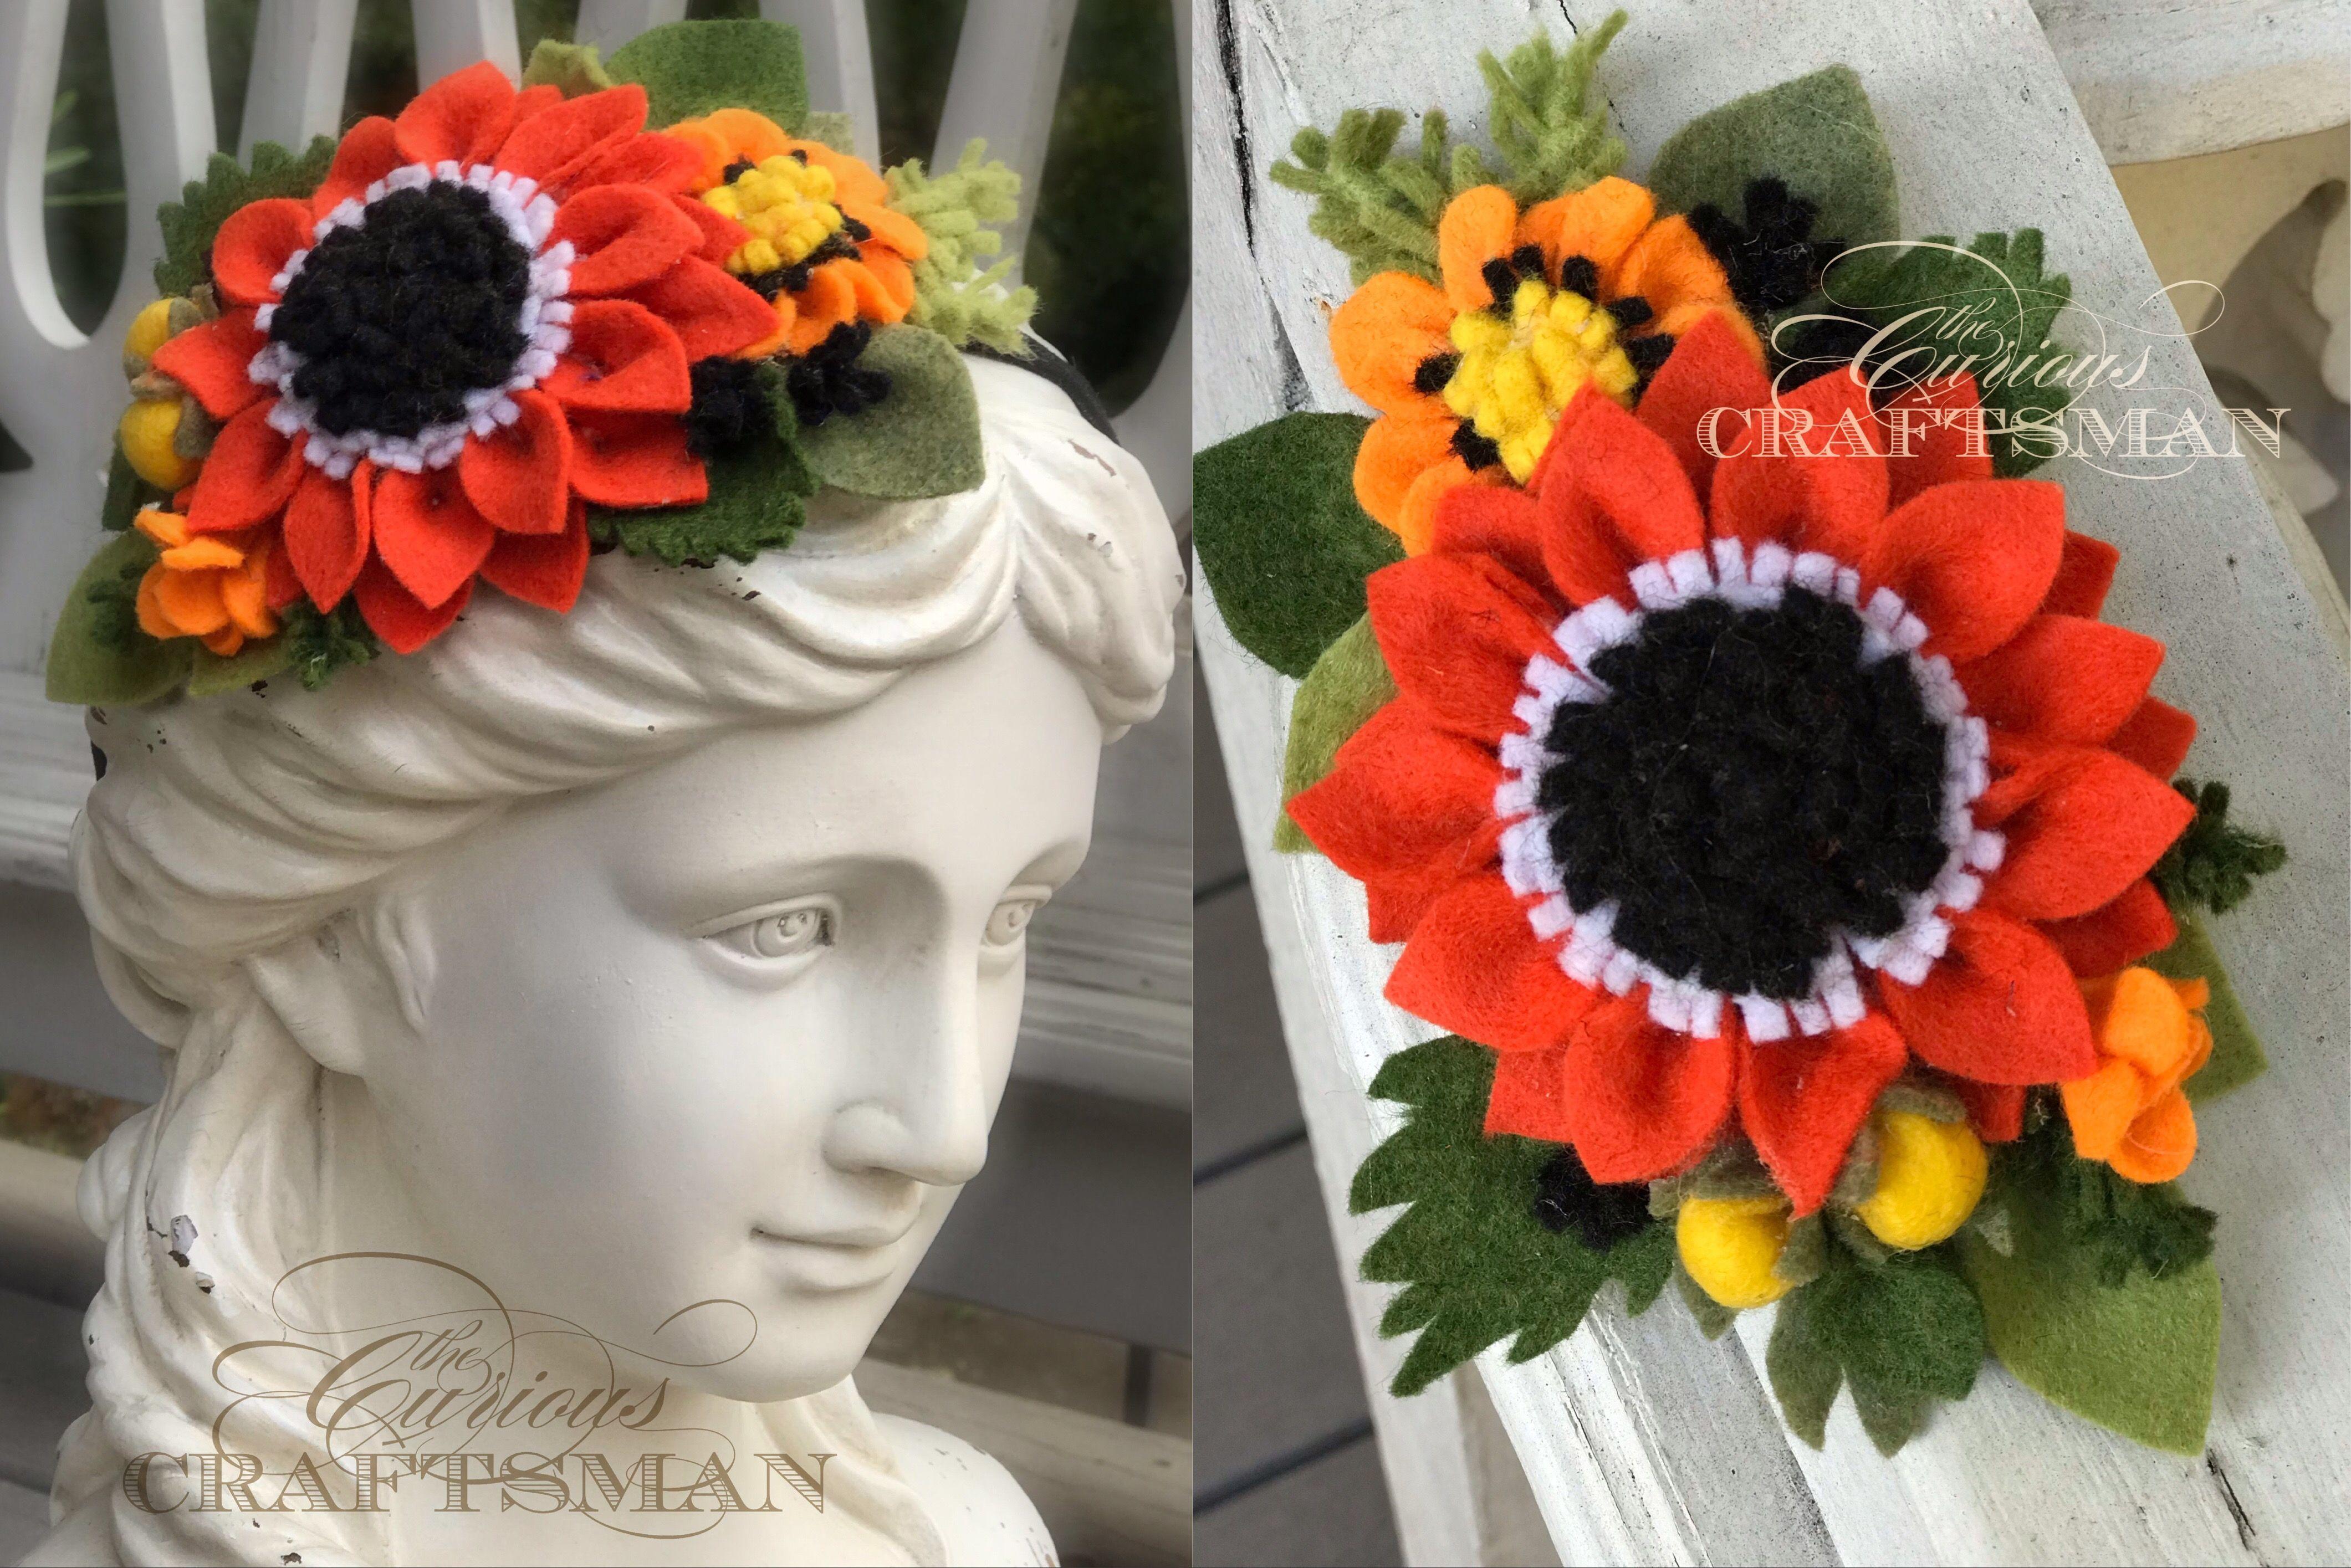 Fall | Halloween Felt Sunflower Headband #feltflowerheadbands A new #CuriousCraftsman creative venture: Felt Flower Headbands for all those little fashionistas out there!